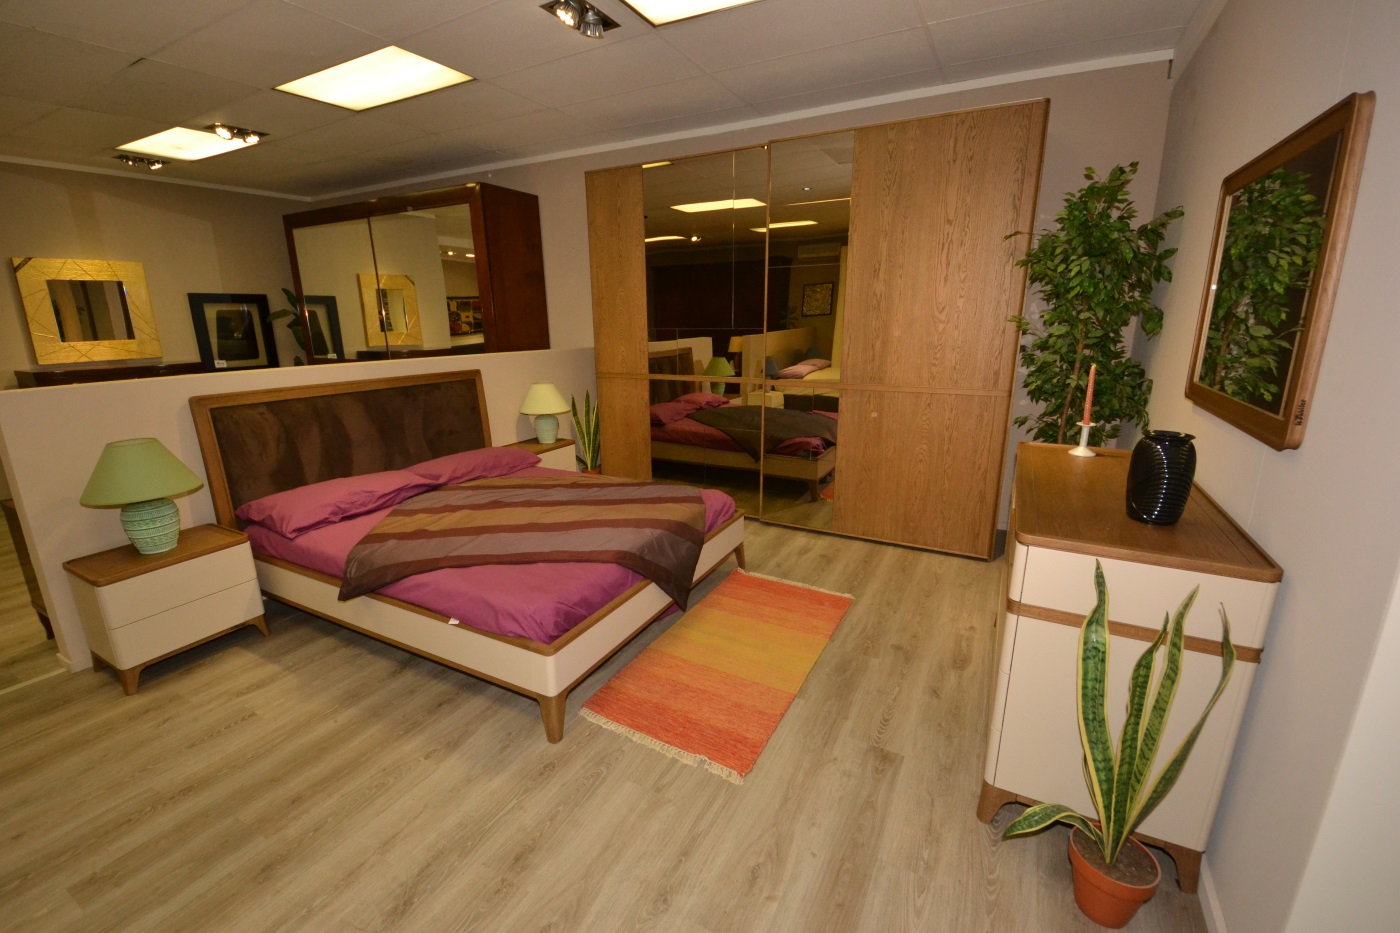 Fablier camere da letto dsc with fablier camere da letto - Offerte mobili camera da letto ...